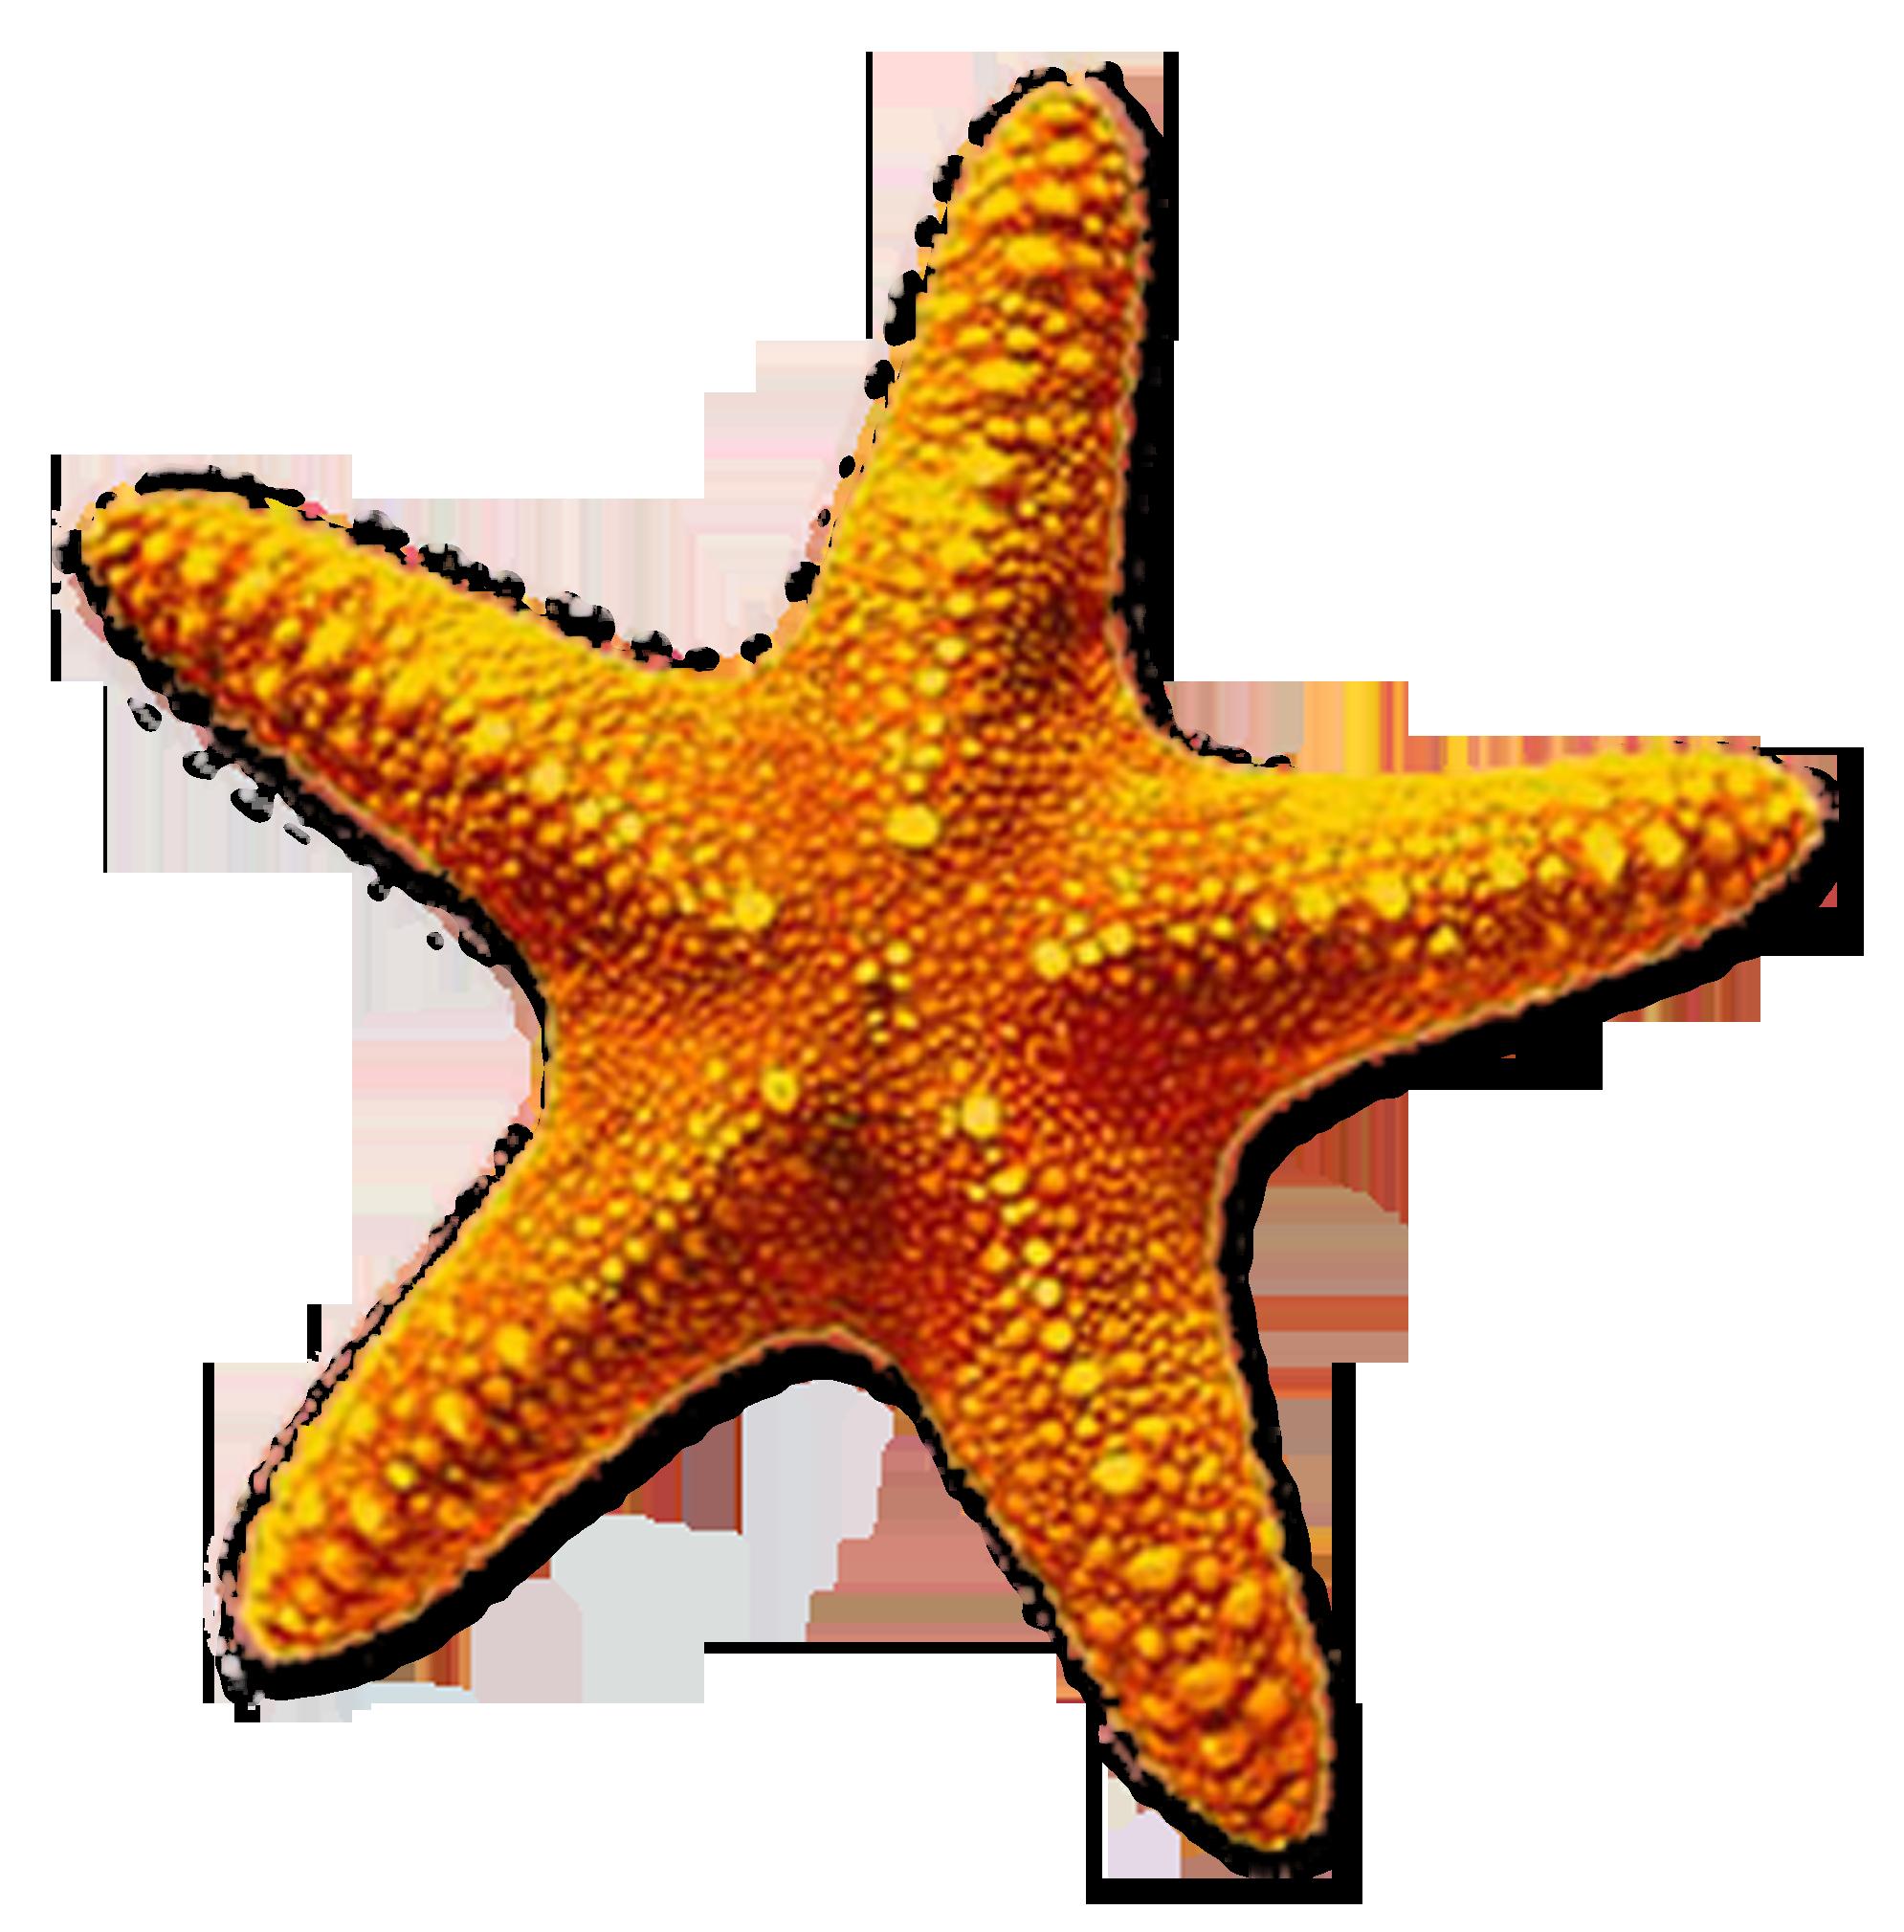 Starfish Png Google Search Ideias Desenhos Legais